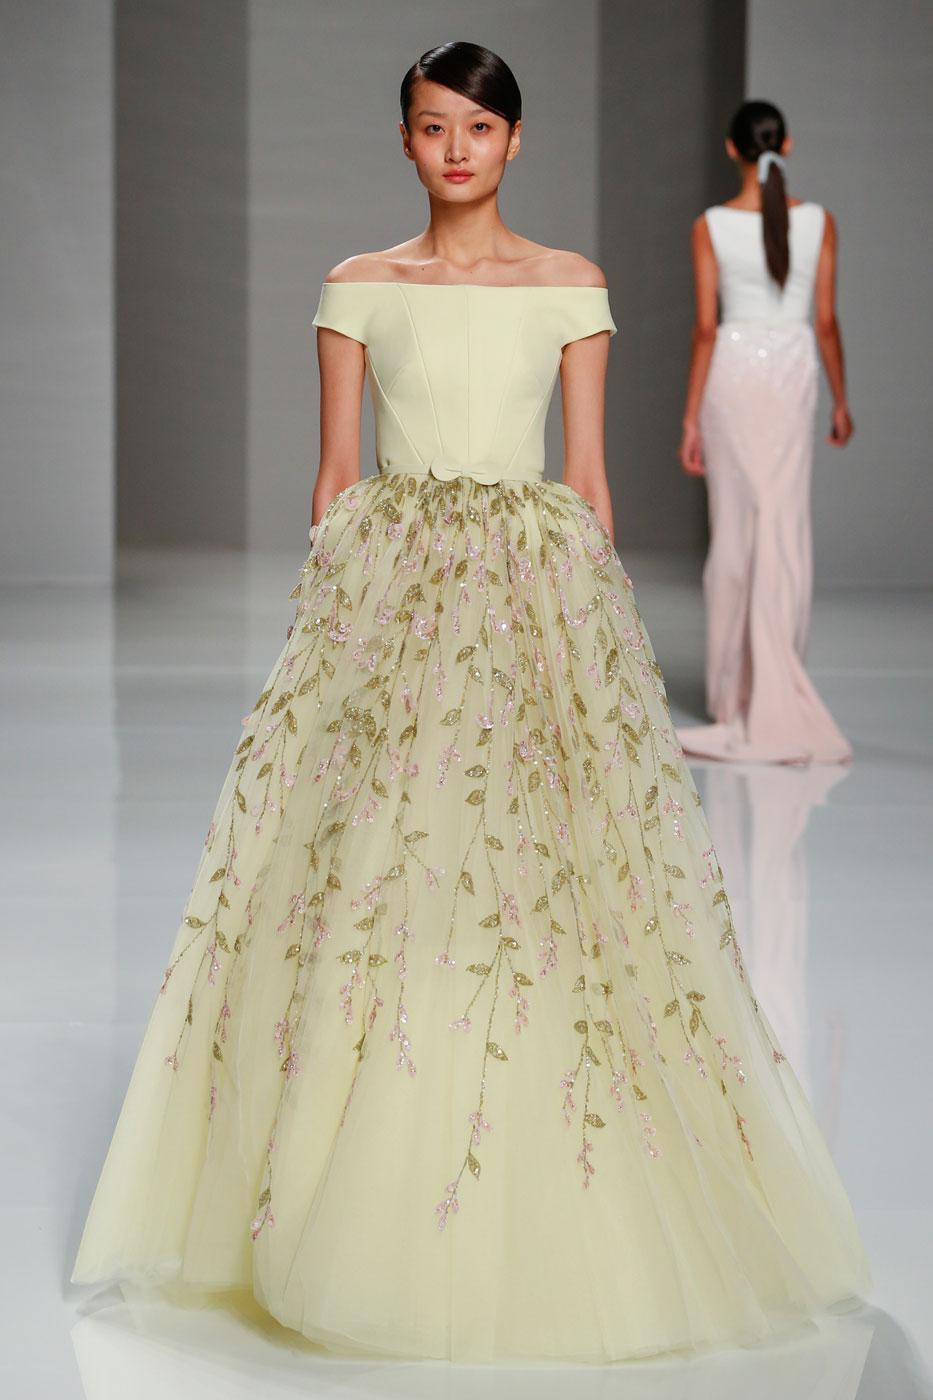 Georges-Hobeika-fashion-runway-show-haute-couture-paris-spring-2015-the-impression-73